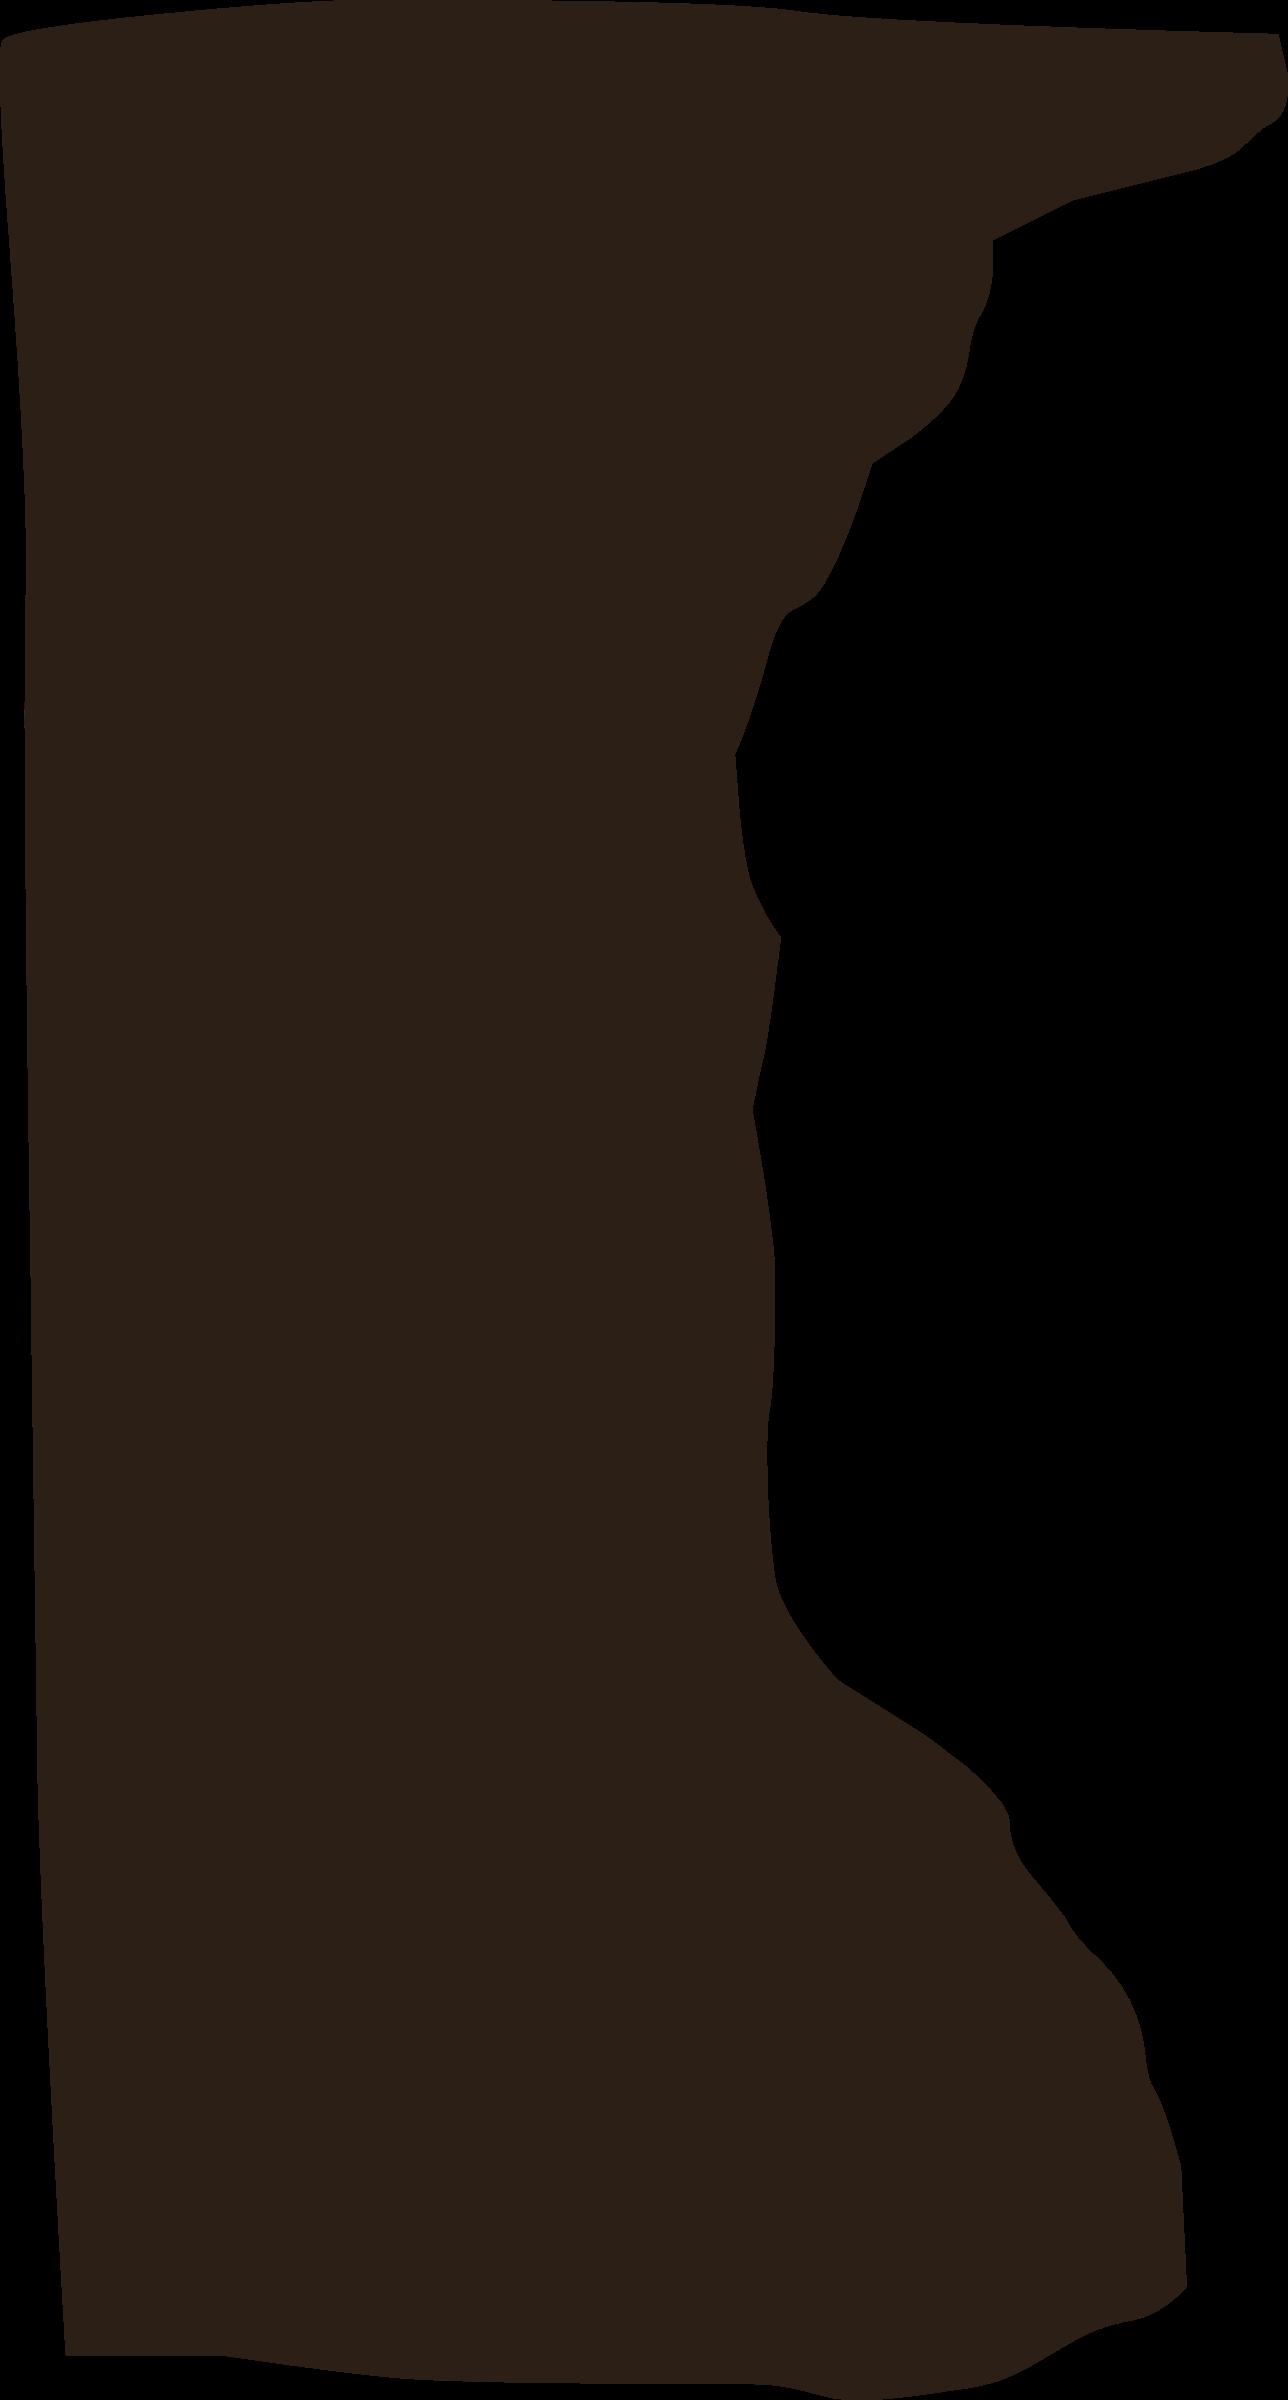 Glitch clipart silhouette (PNG) IMAGE Firebog BIG Pillar